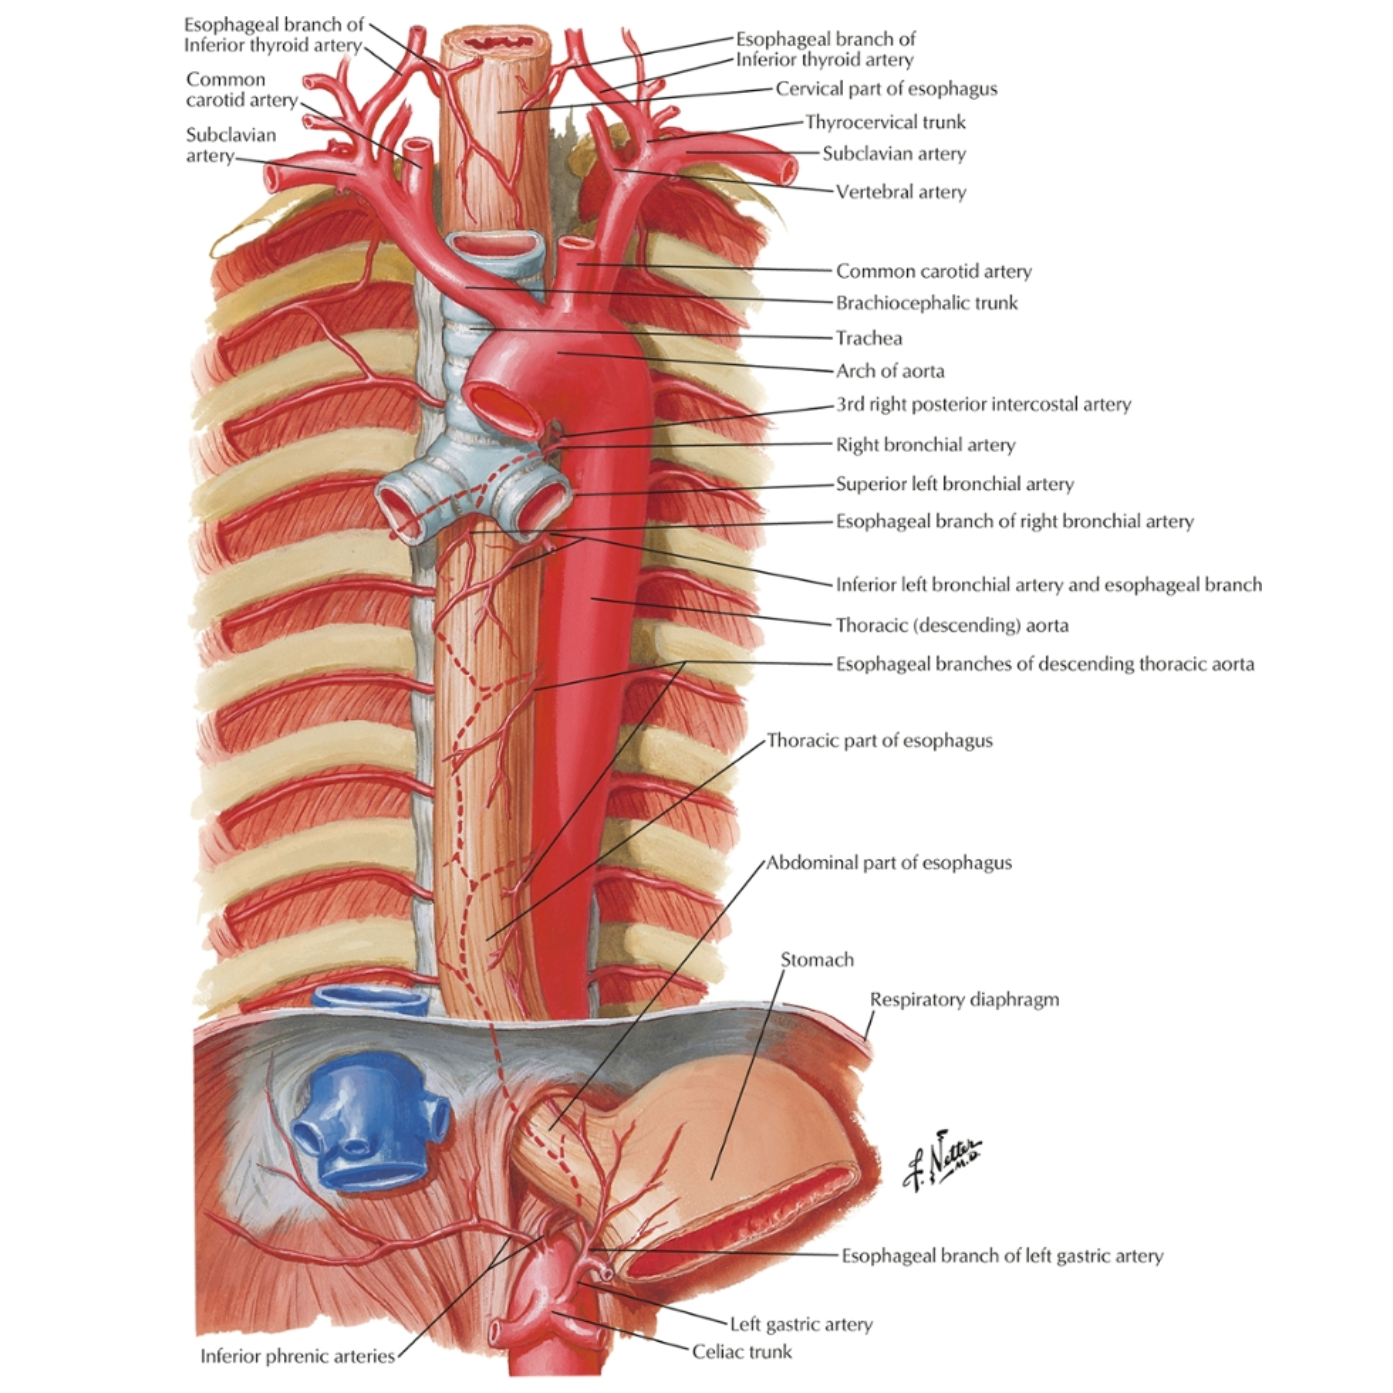 esophagusarteries.png